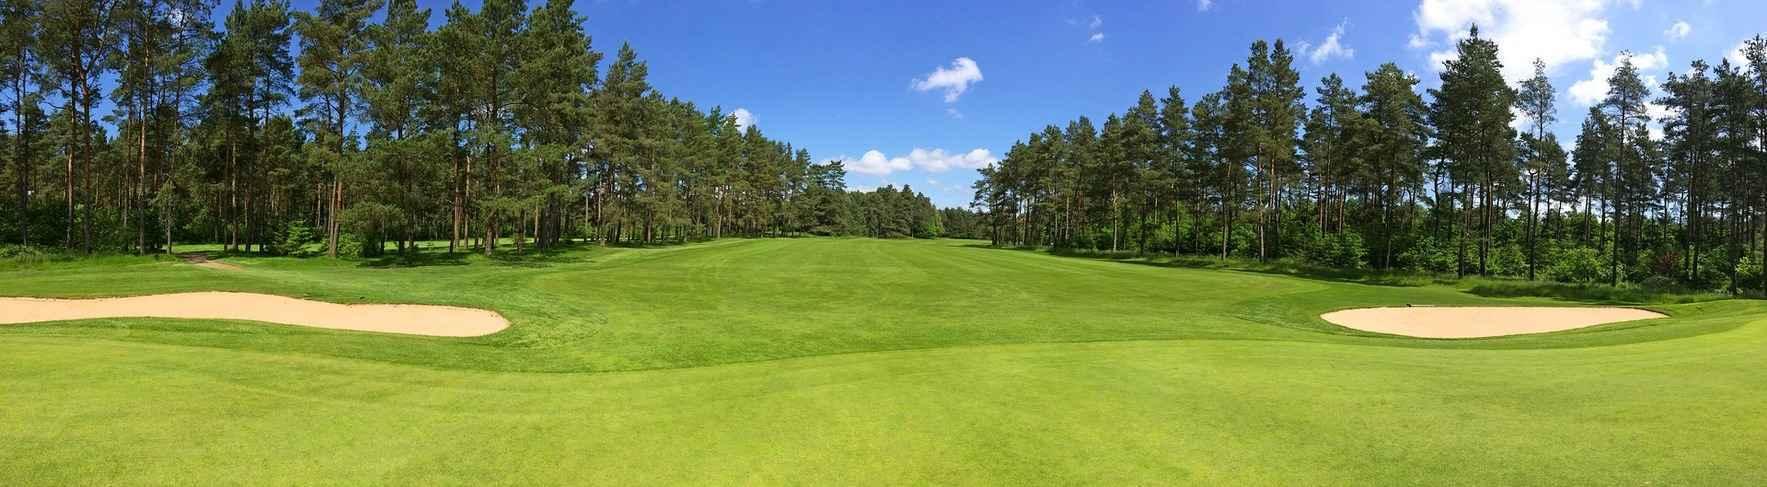 Straydog Golf Tournament image